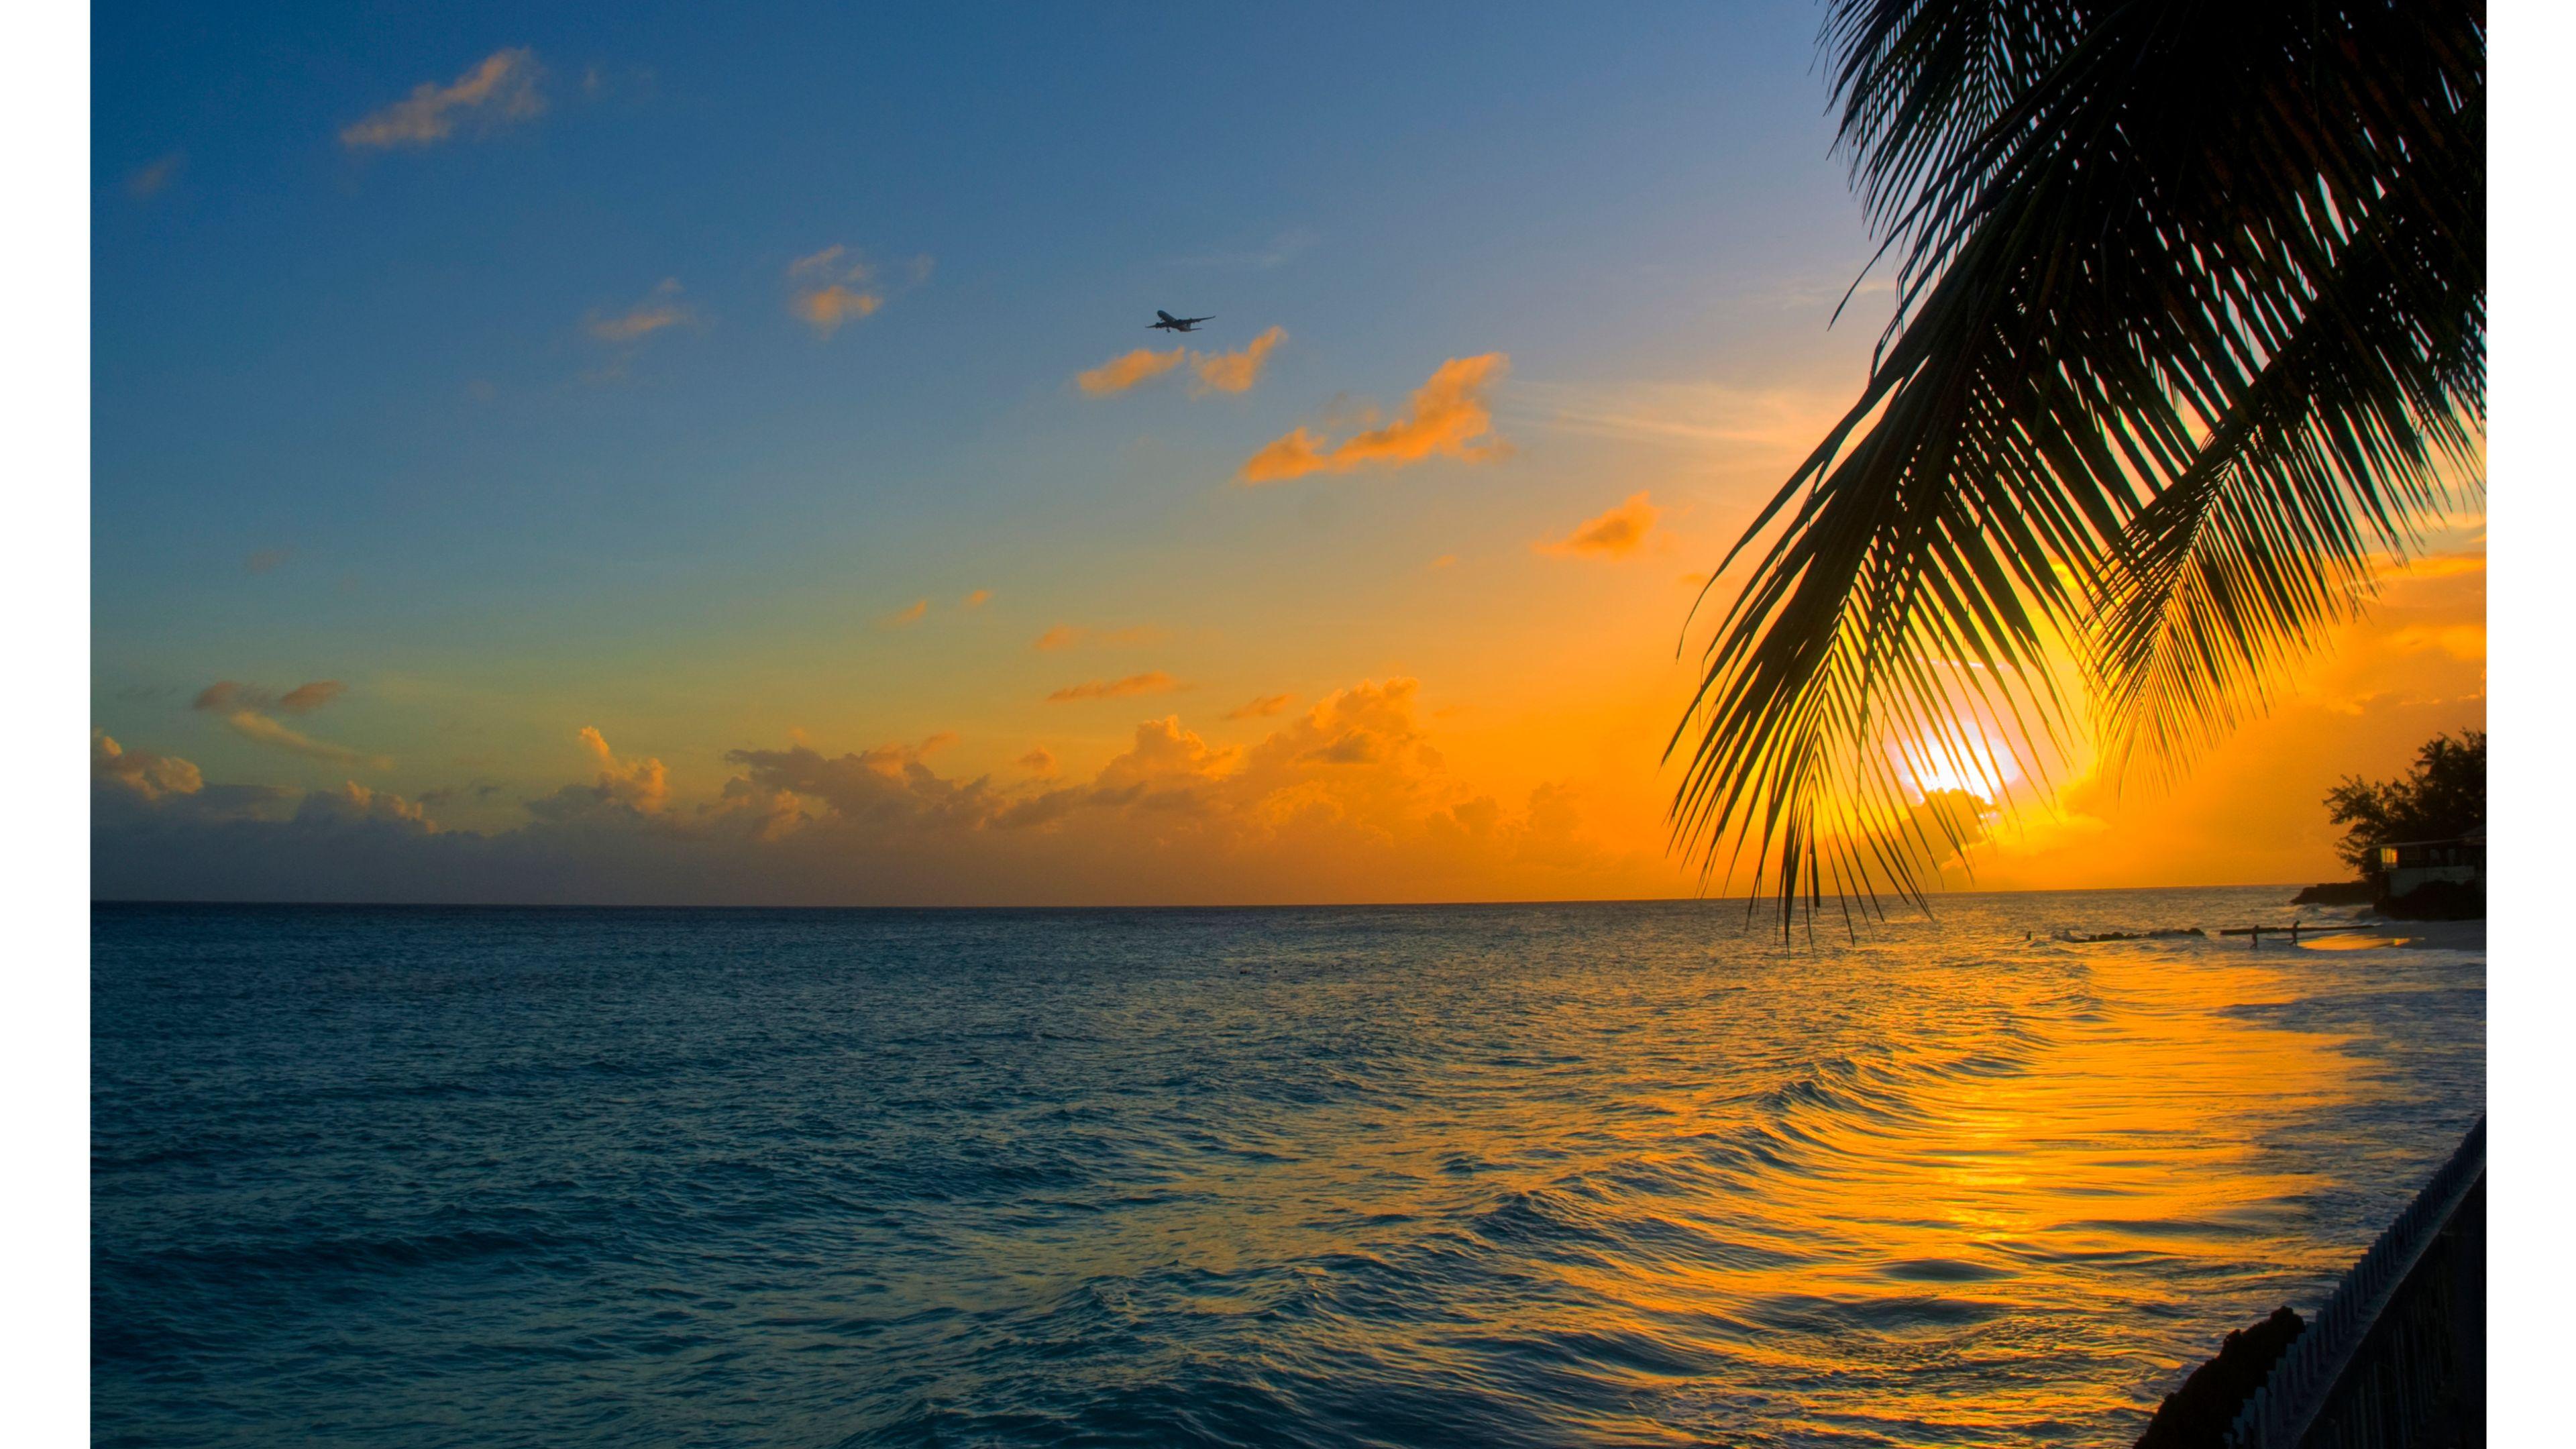 50 Best Beautiful Barbados Images On Pinterest: 4K Sunset Wallpaper